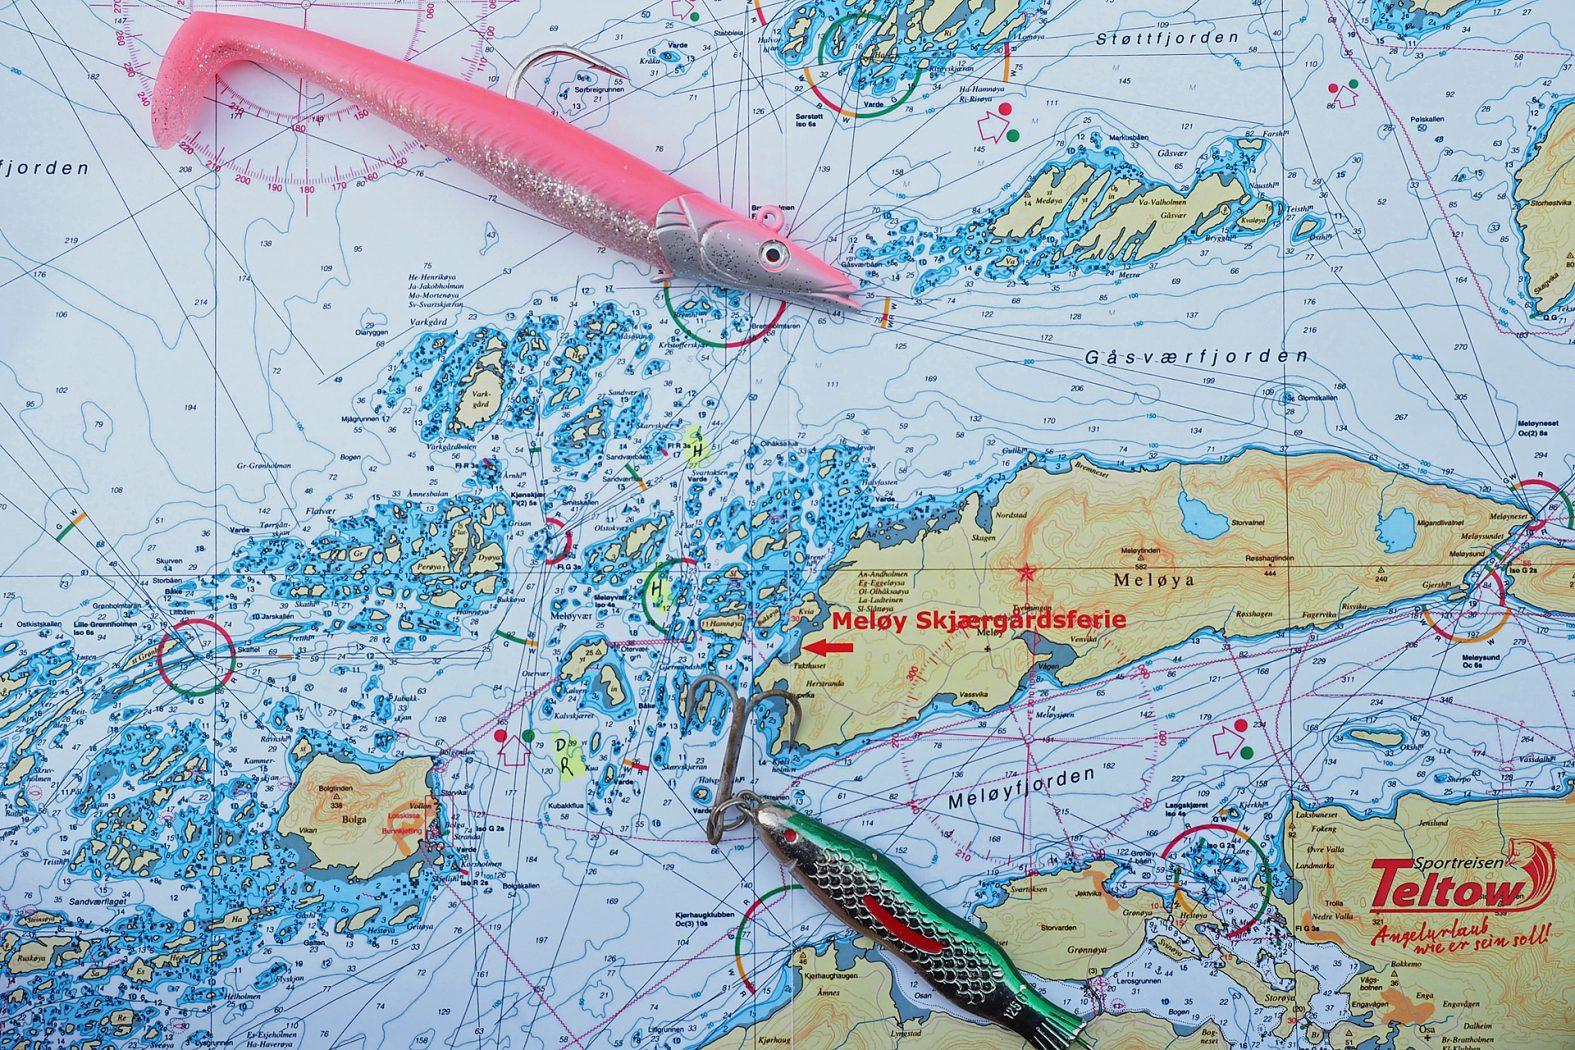 Seekarte Mittelnorwegen